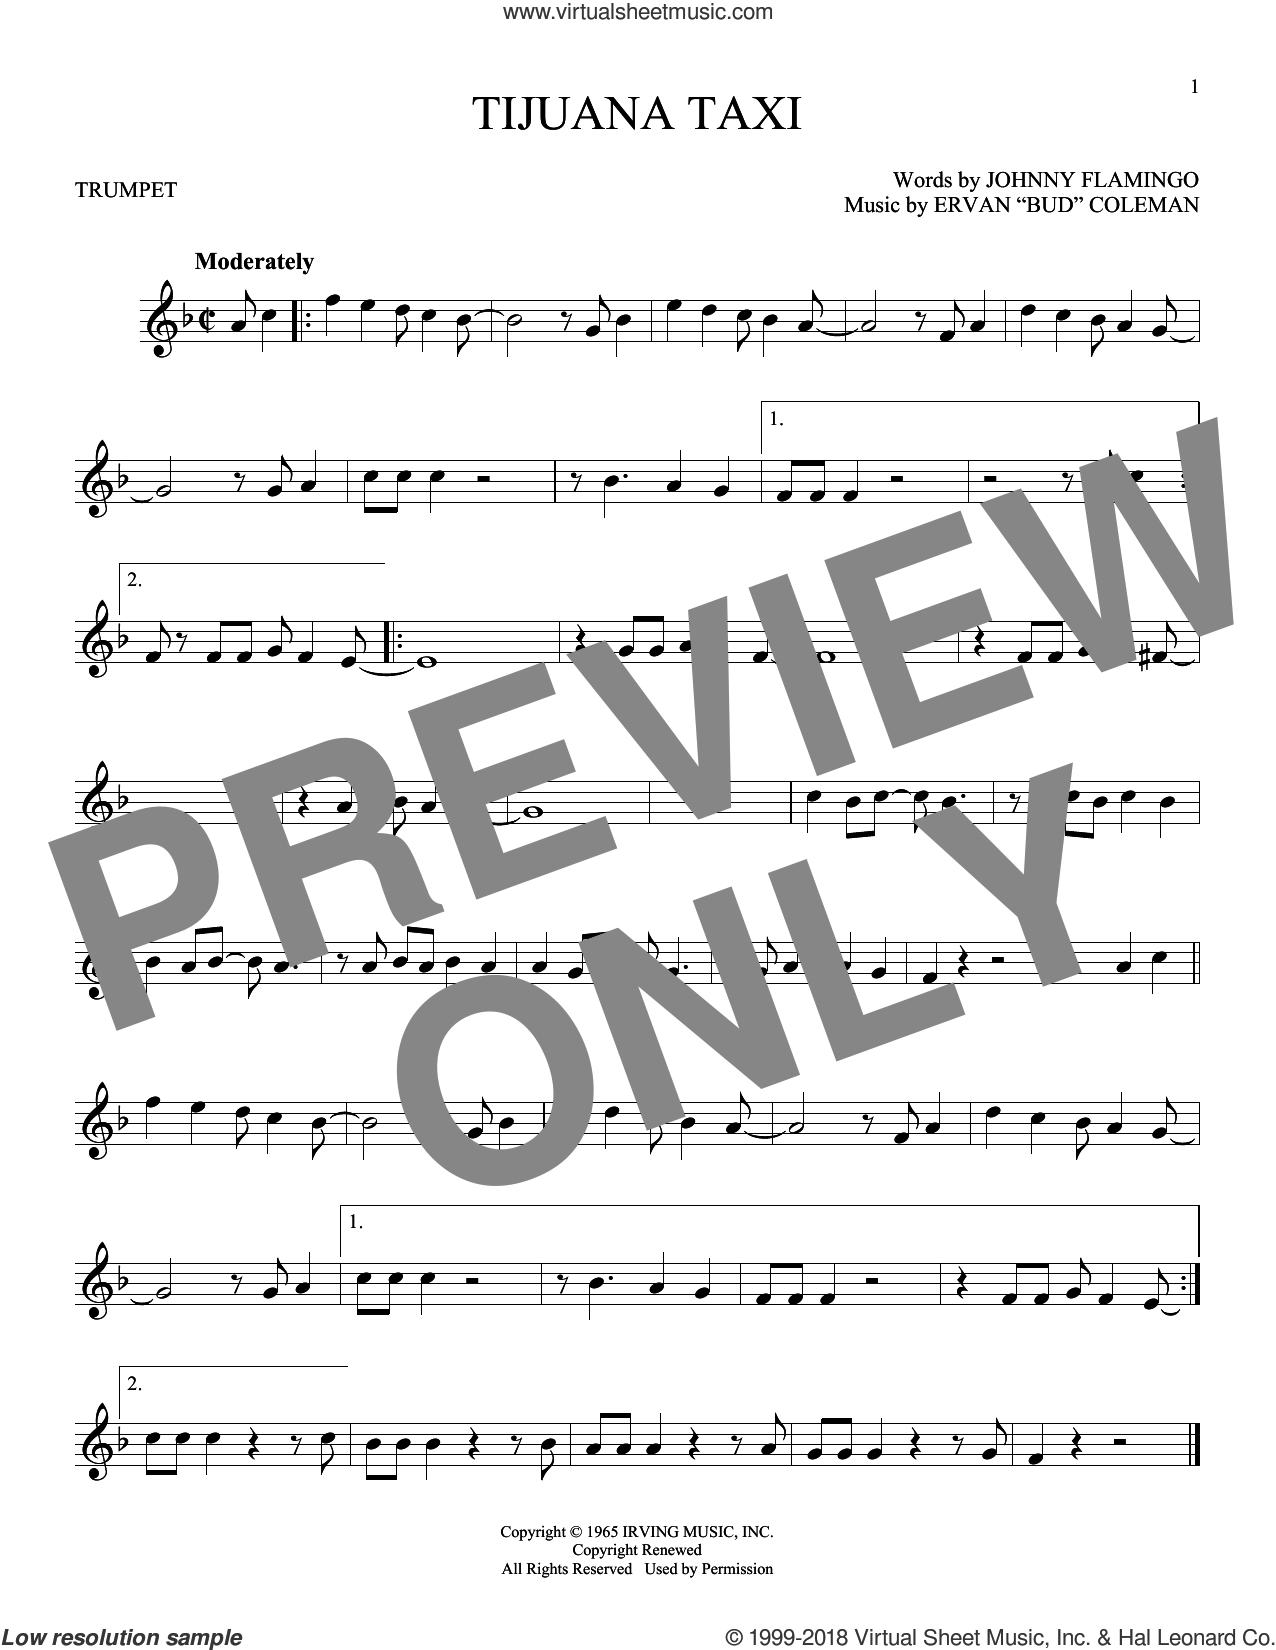 Tijuana Taxi sheet music for trumpet solo by Herb Alpert & The Tijuana Brass, Ervan 'Bud' Coleman and Johnny Flamingo, intermediate skill level